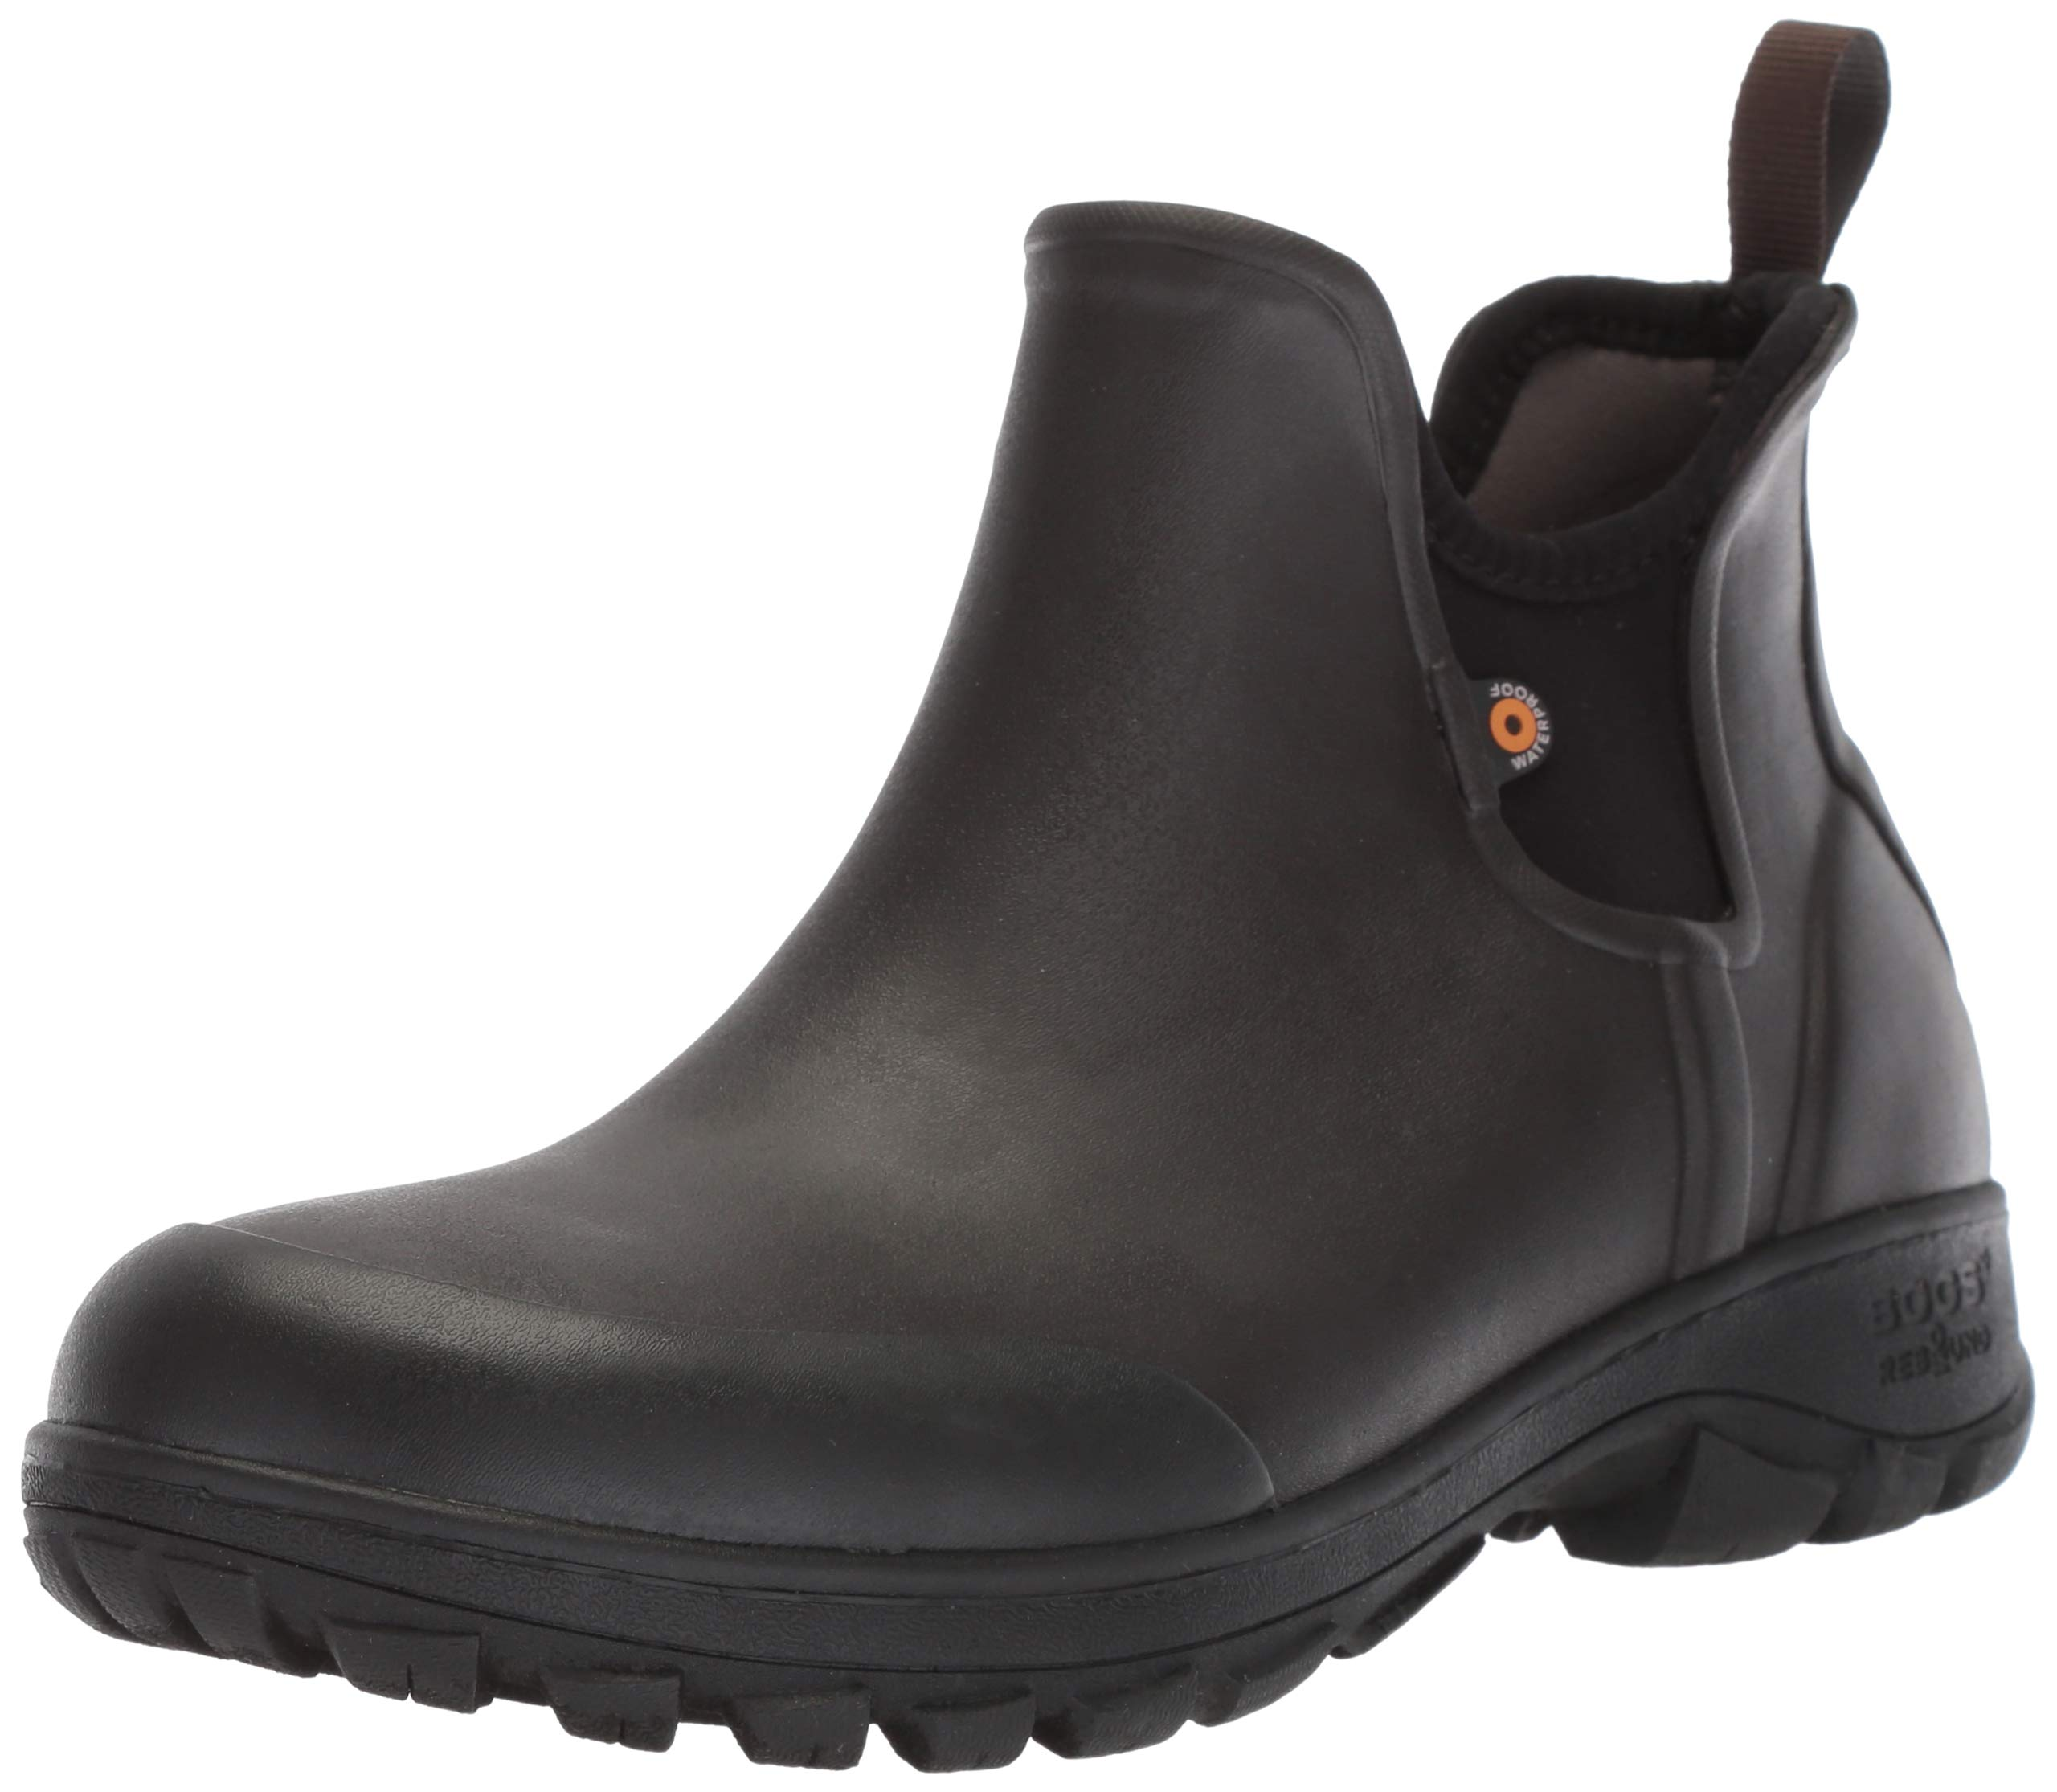 Bogs Men's Sauvie Slip Chukka Boot, Dark Brown, 13 D(M) US